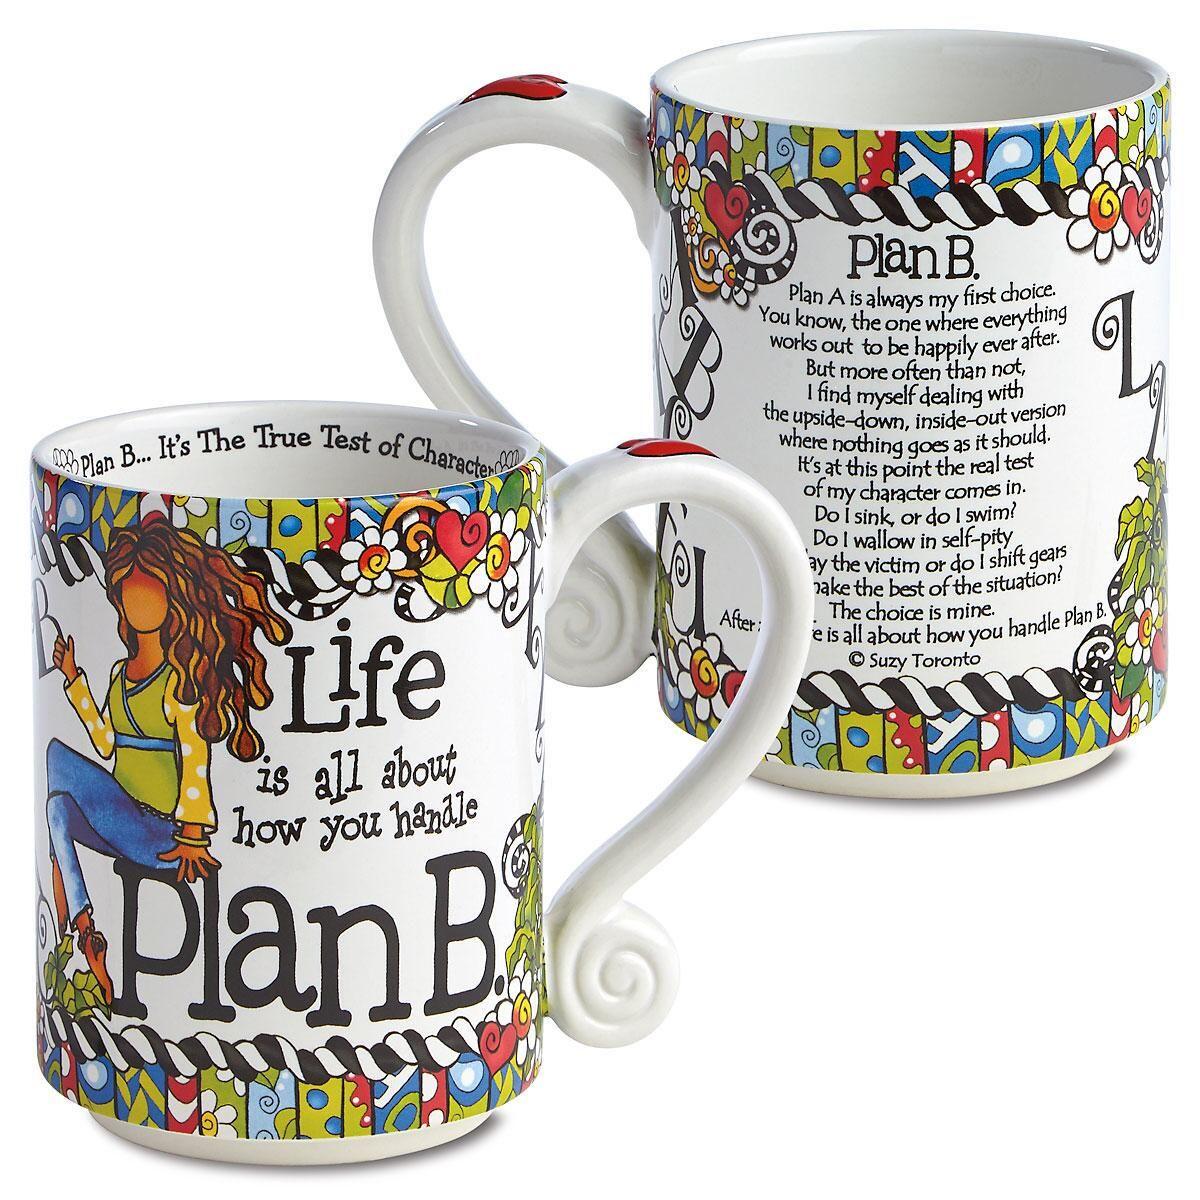 Plan B Novelty Mug